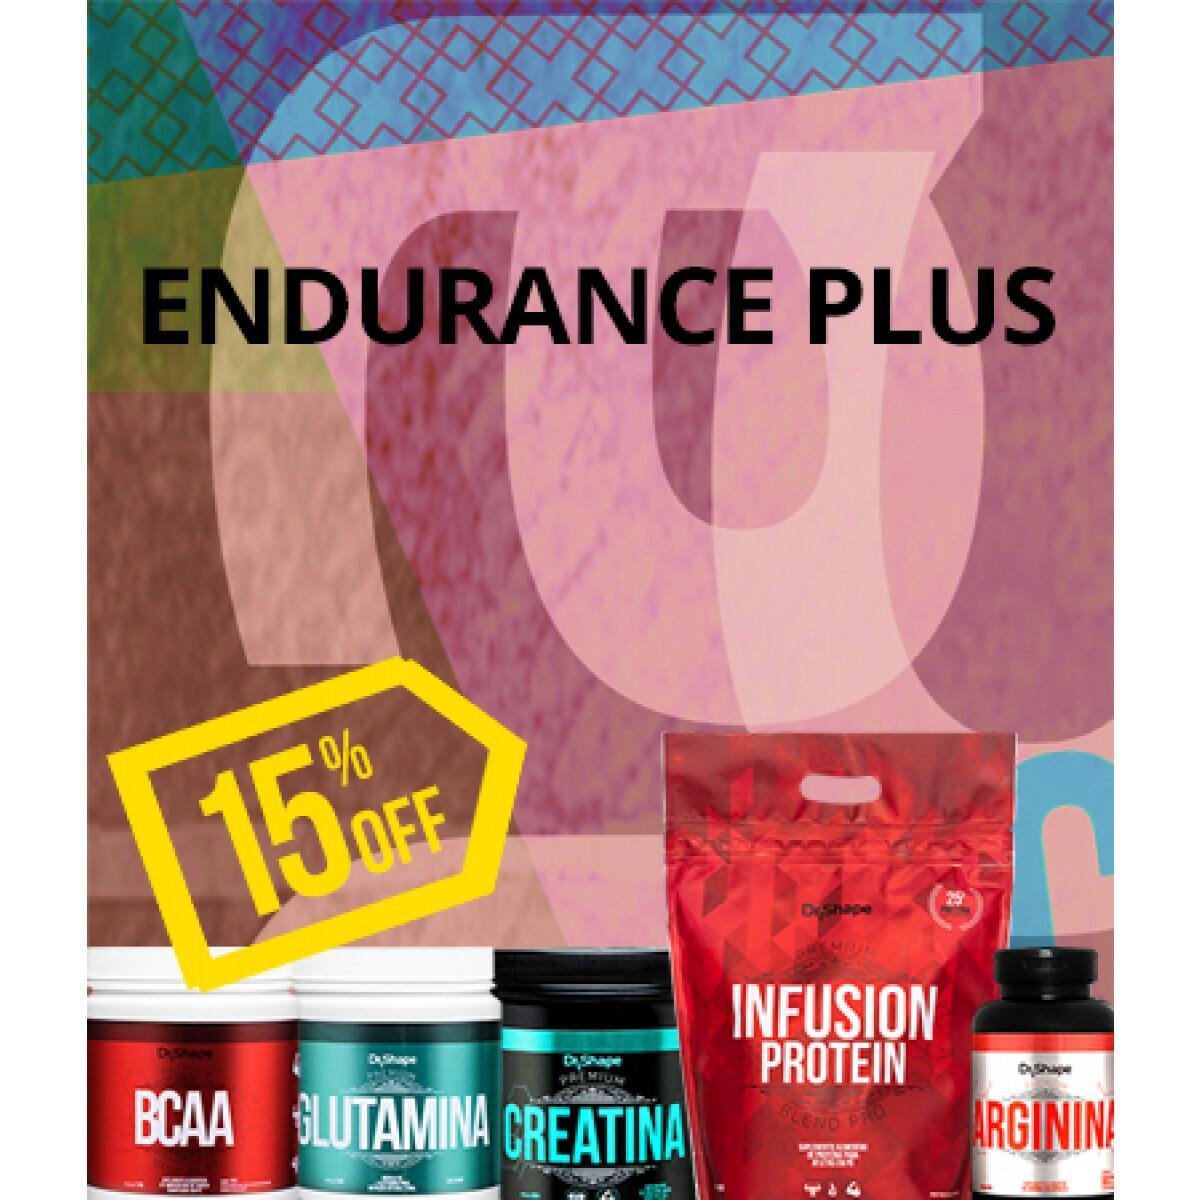 Endurance Plus